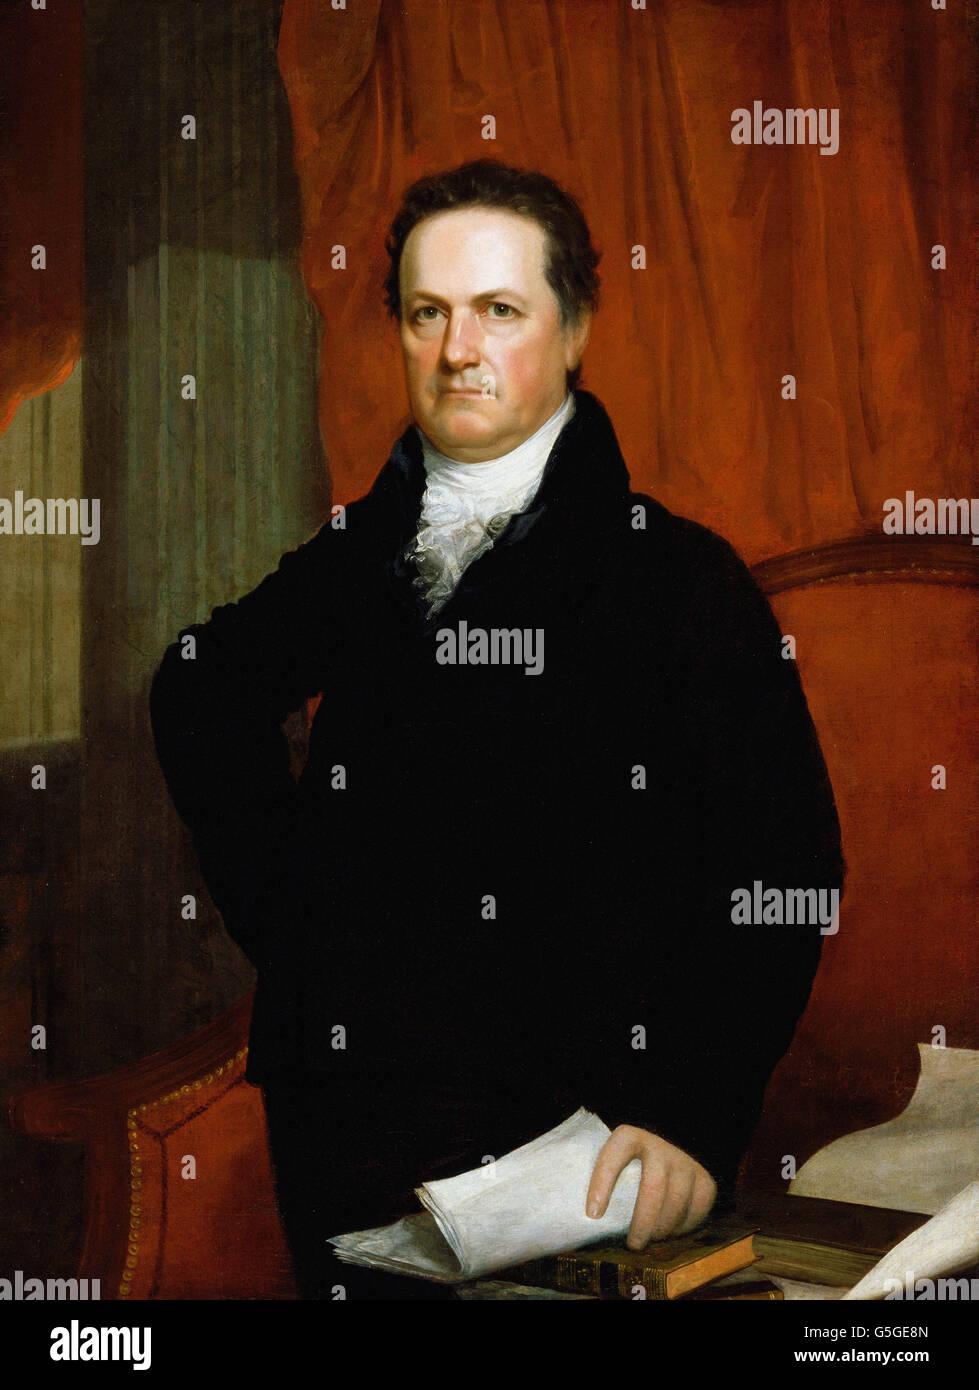 John Wesley Jarvis - Portrait of DeWitt Clinton (ca. 1816) - Stock Image